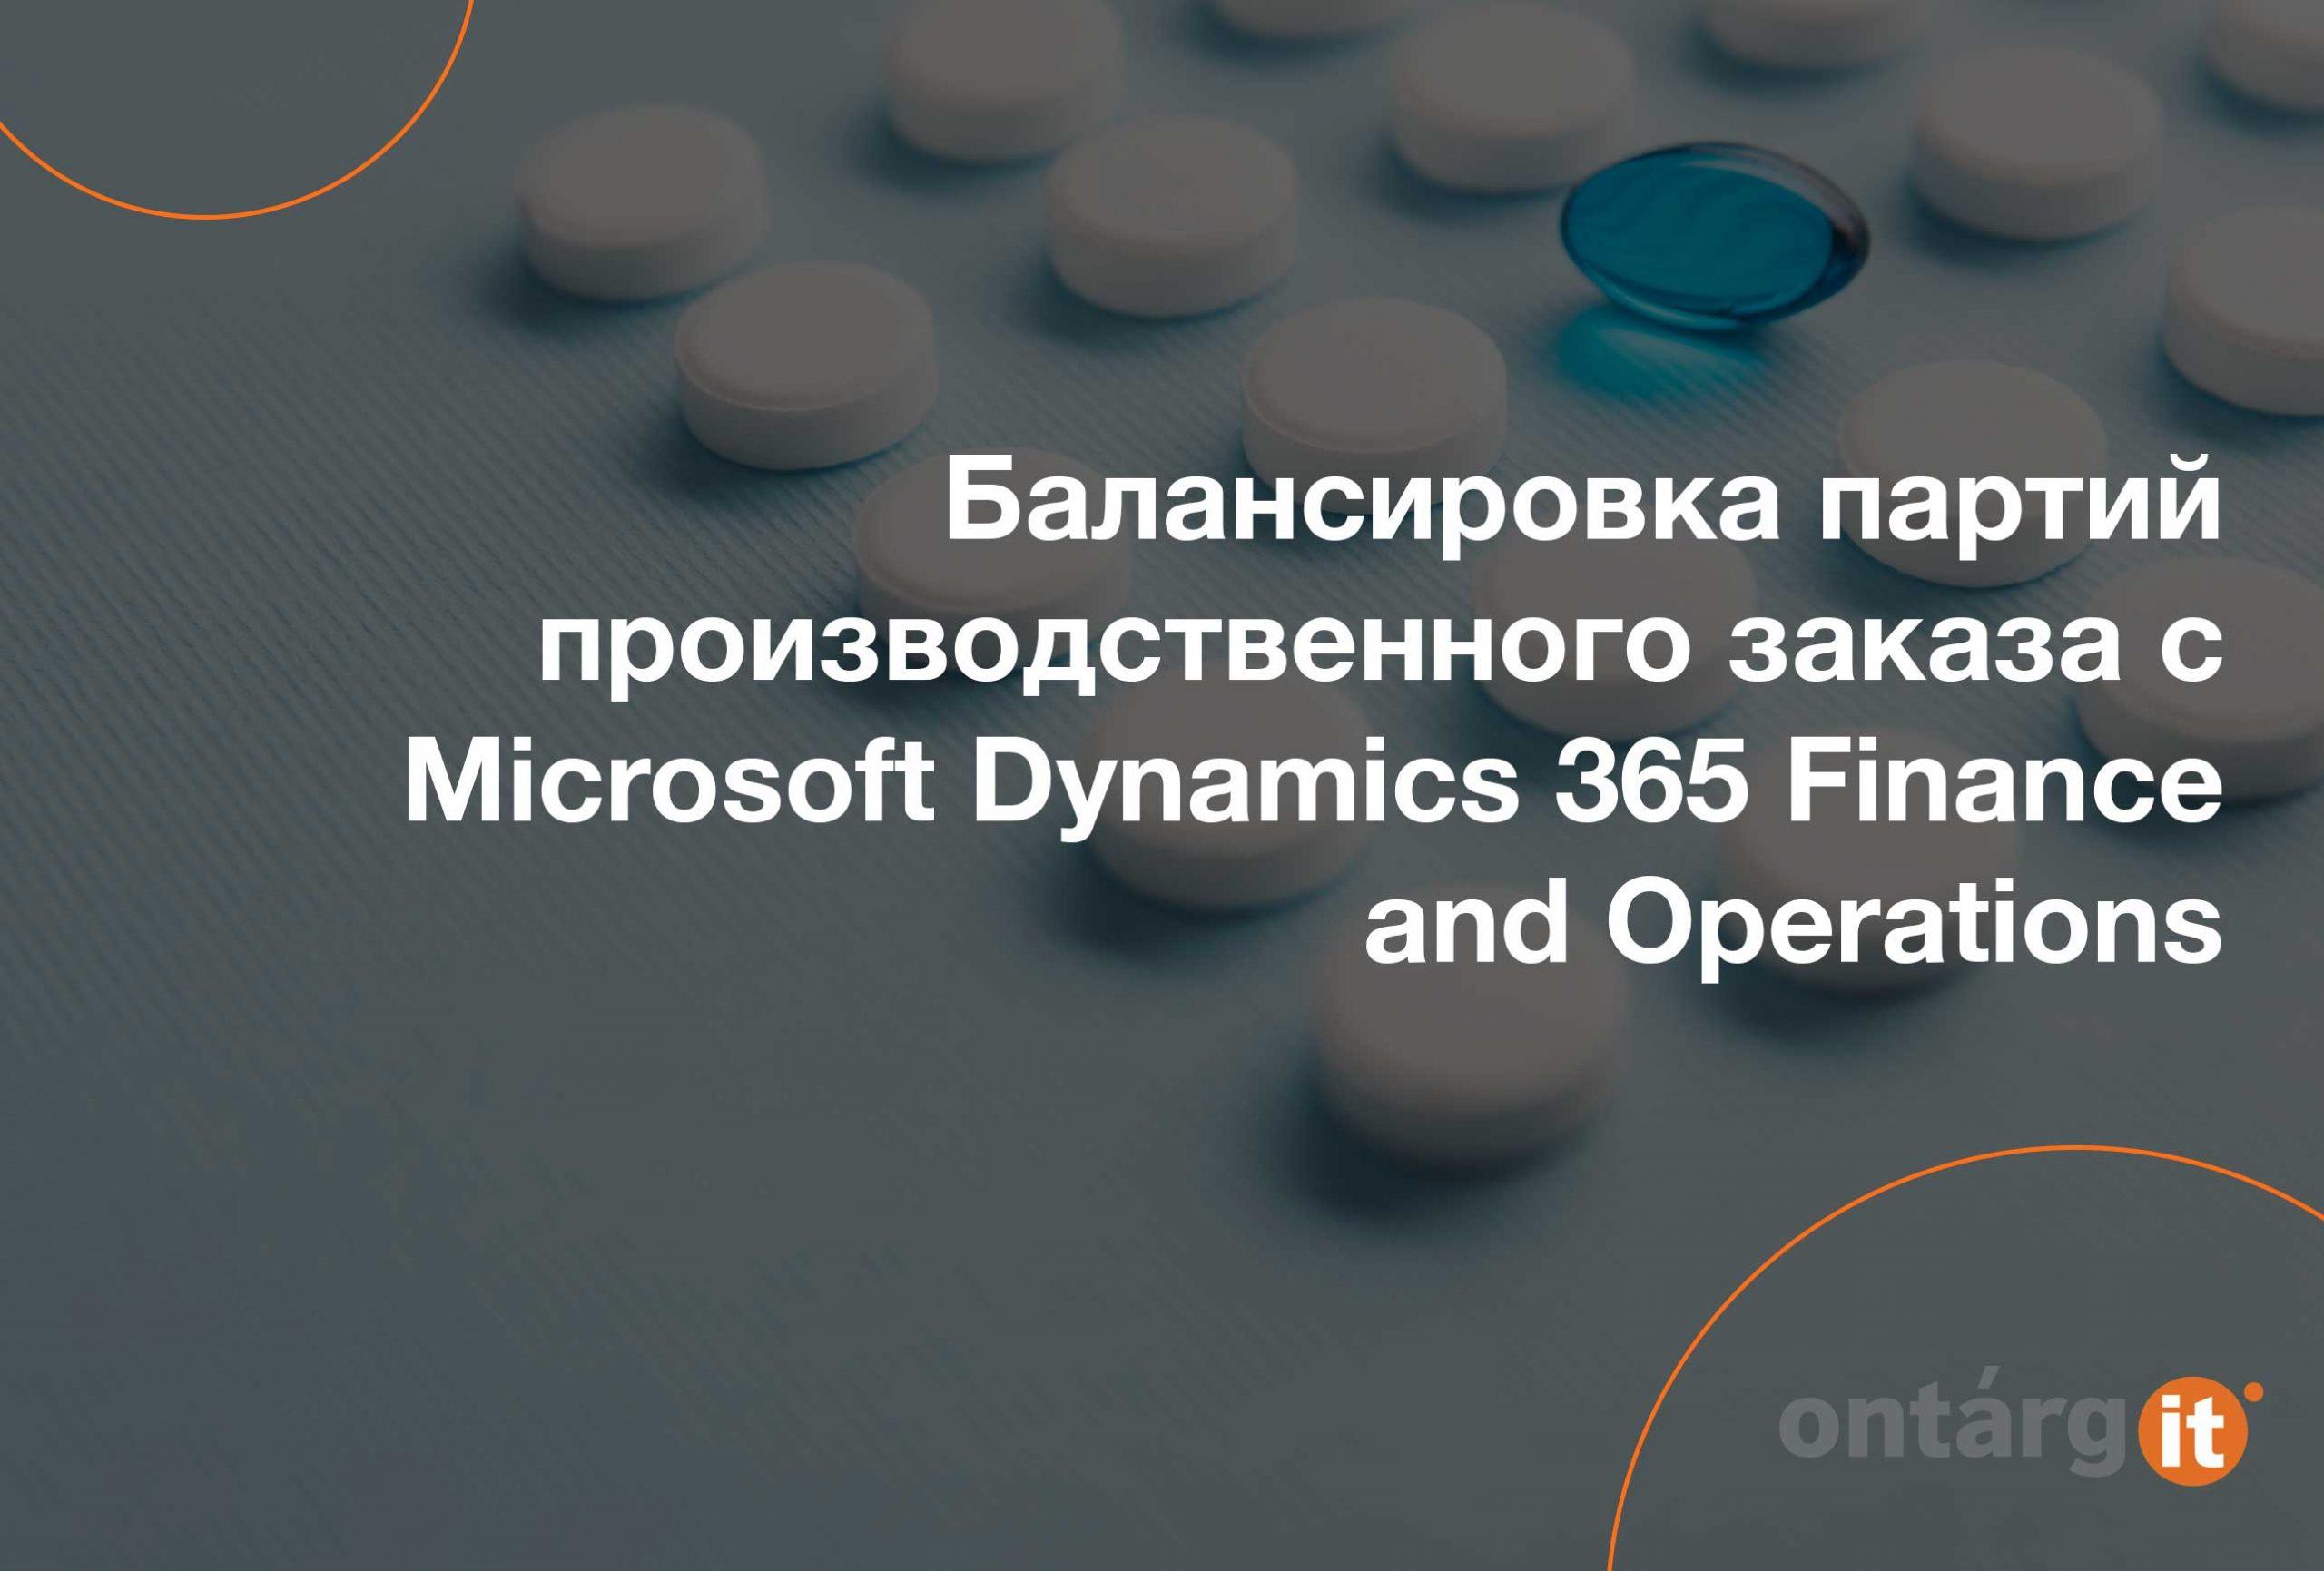 Балансировка-партий-производственного-заказа-с-Microsoft-Dynamics-365-Finance-and-Operations